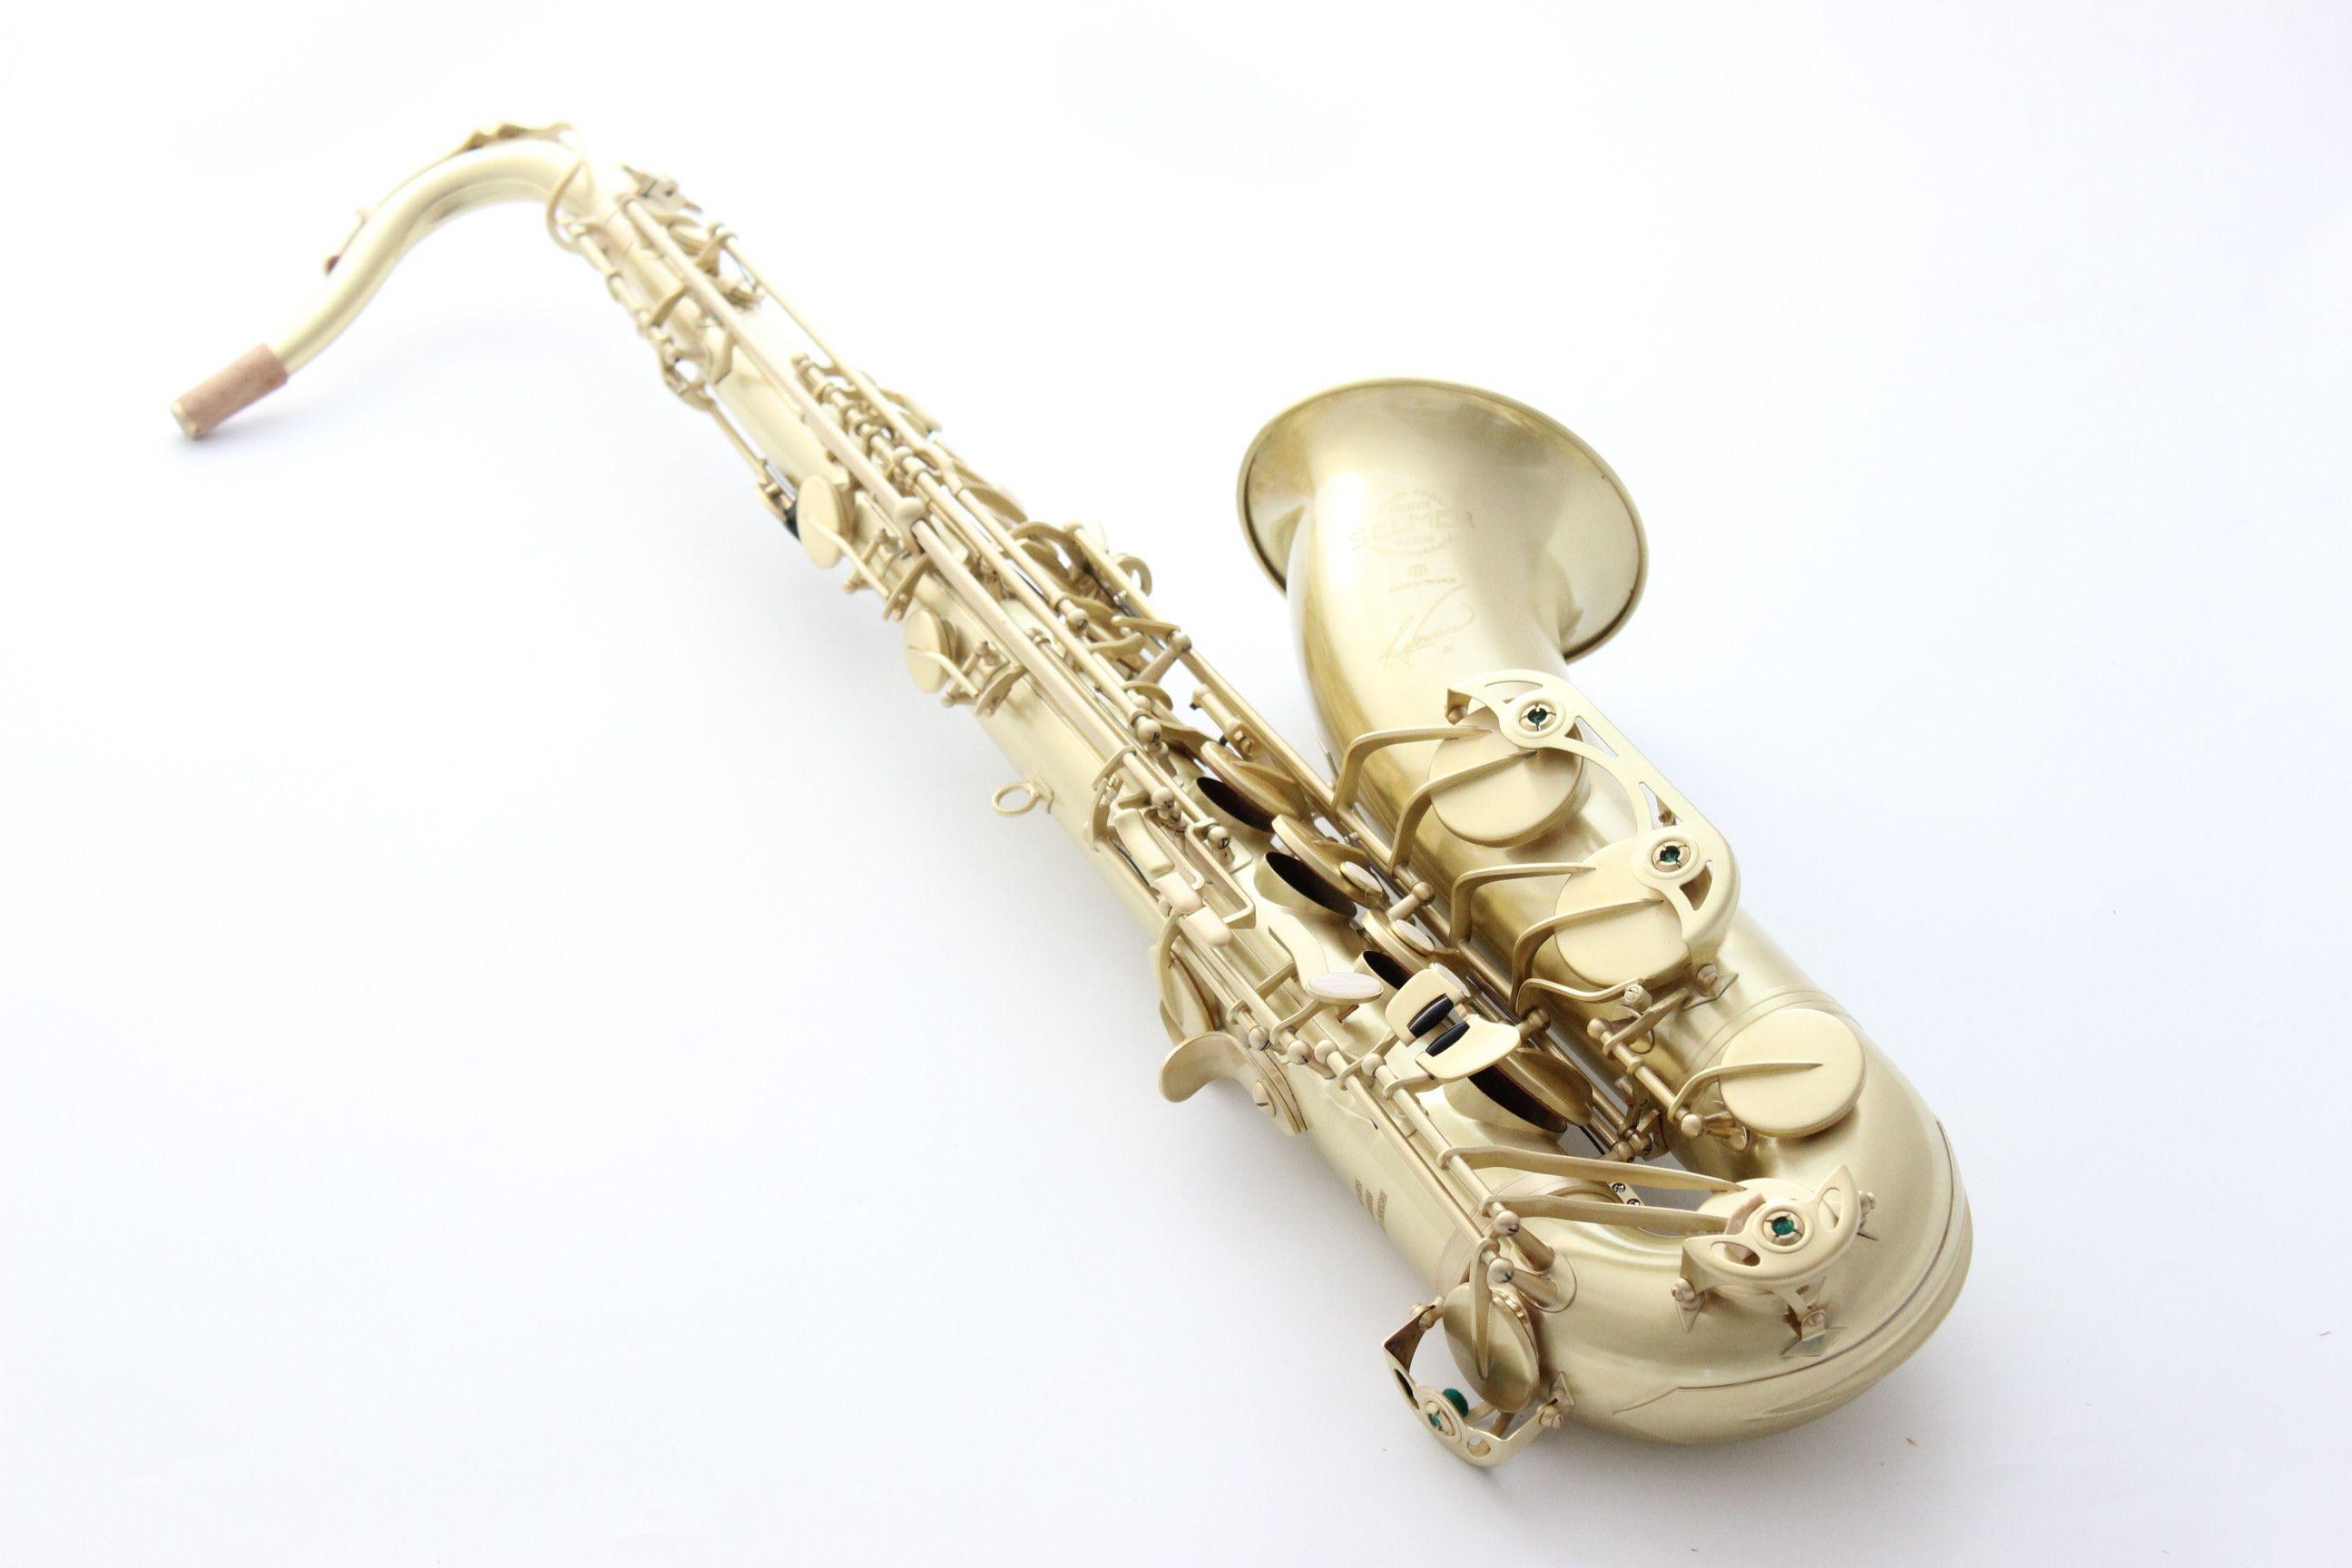 Matte Finish STS-R54 테너 색소폰 프랑스어 Selma B-Flat SAX Professional BB 참조 54 Saxofón Case